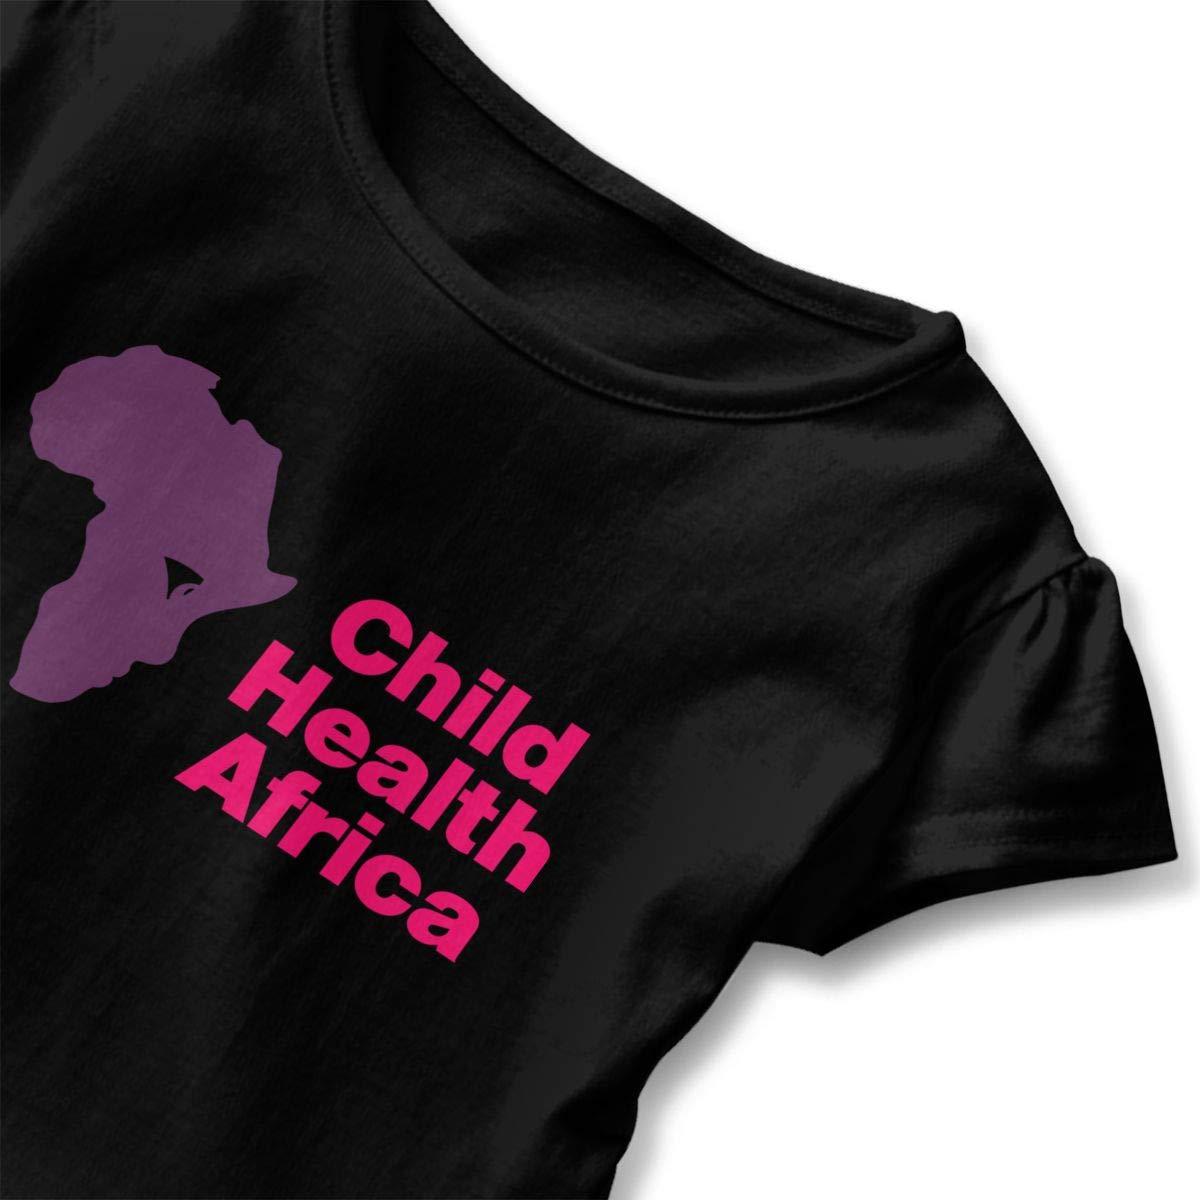 JVNSS Child Health Africa Shirt Design Kids Flounced T Shirts Tee Shirts for 2-6T Baby Girls